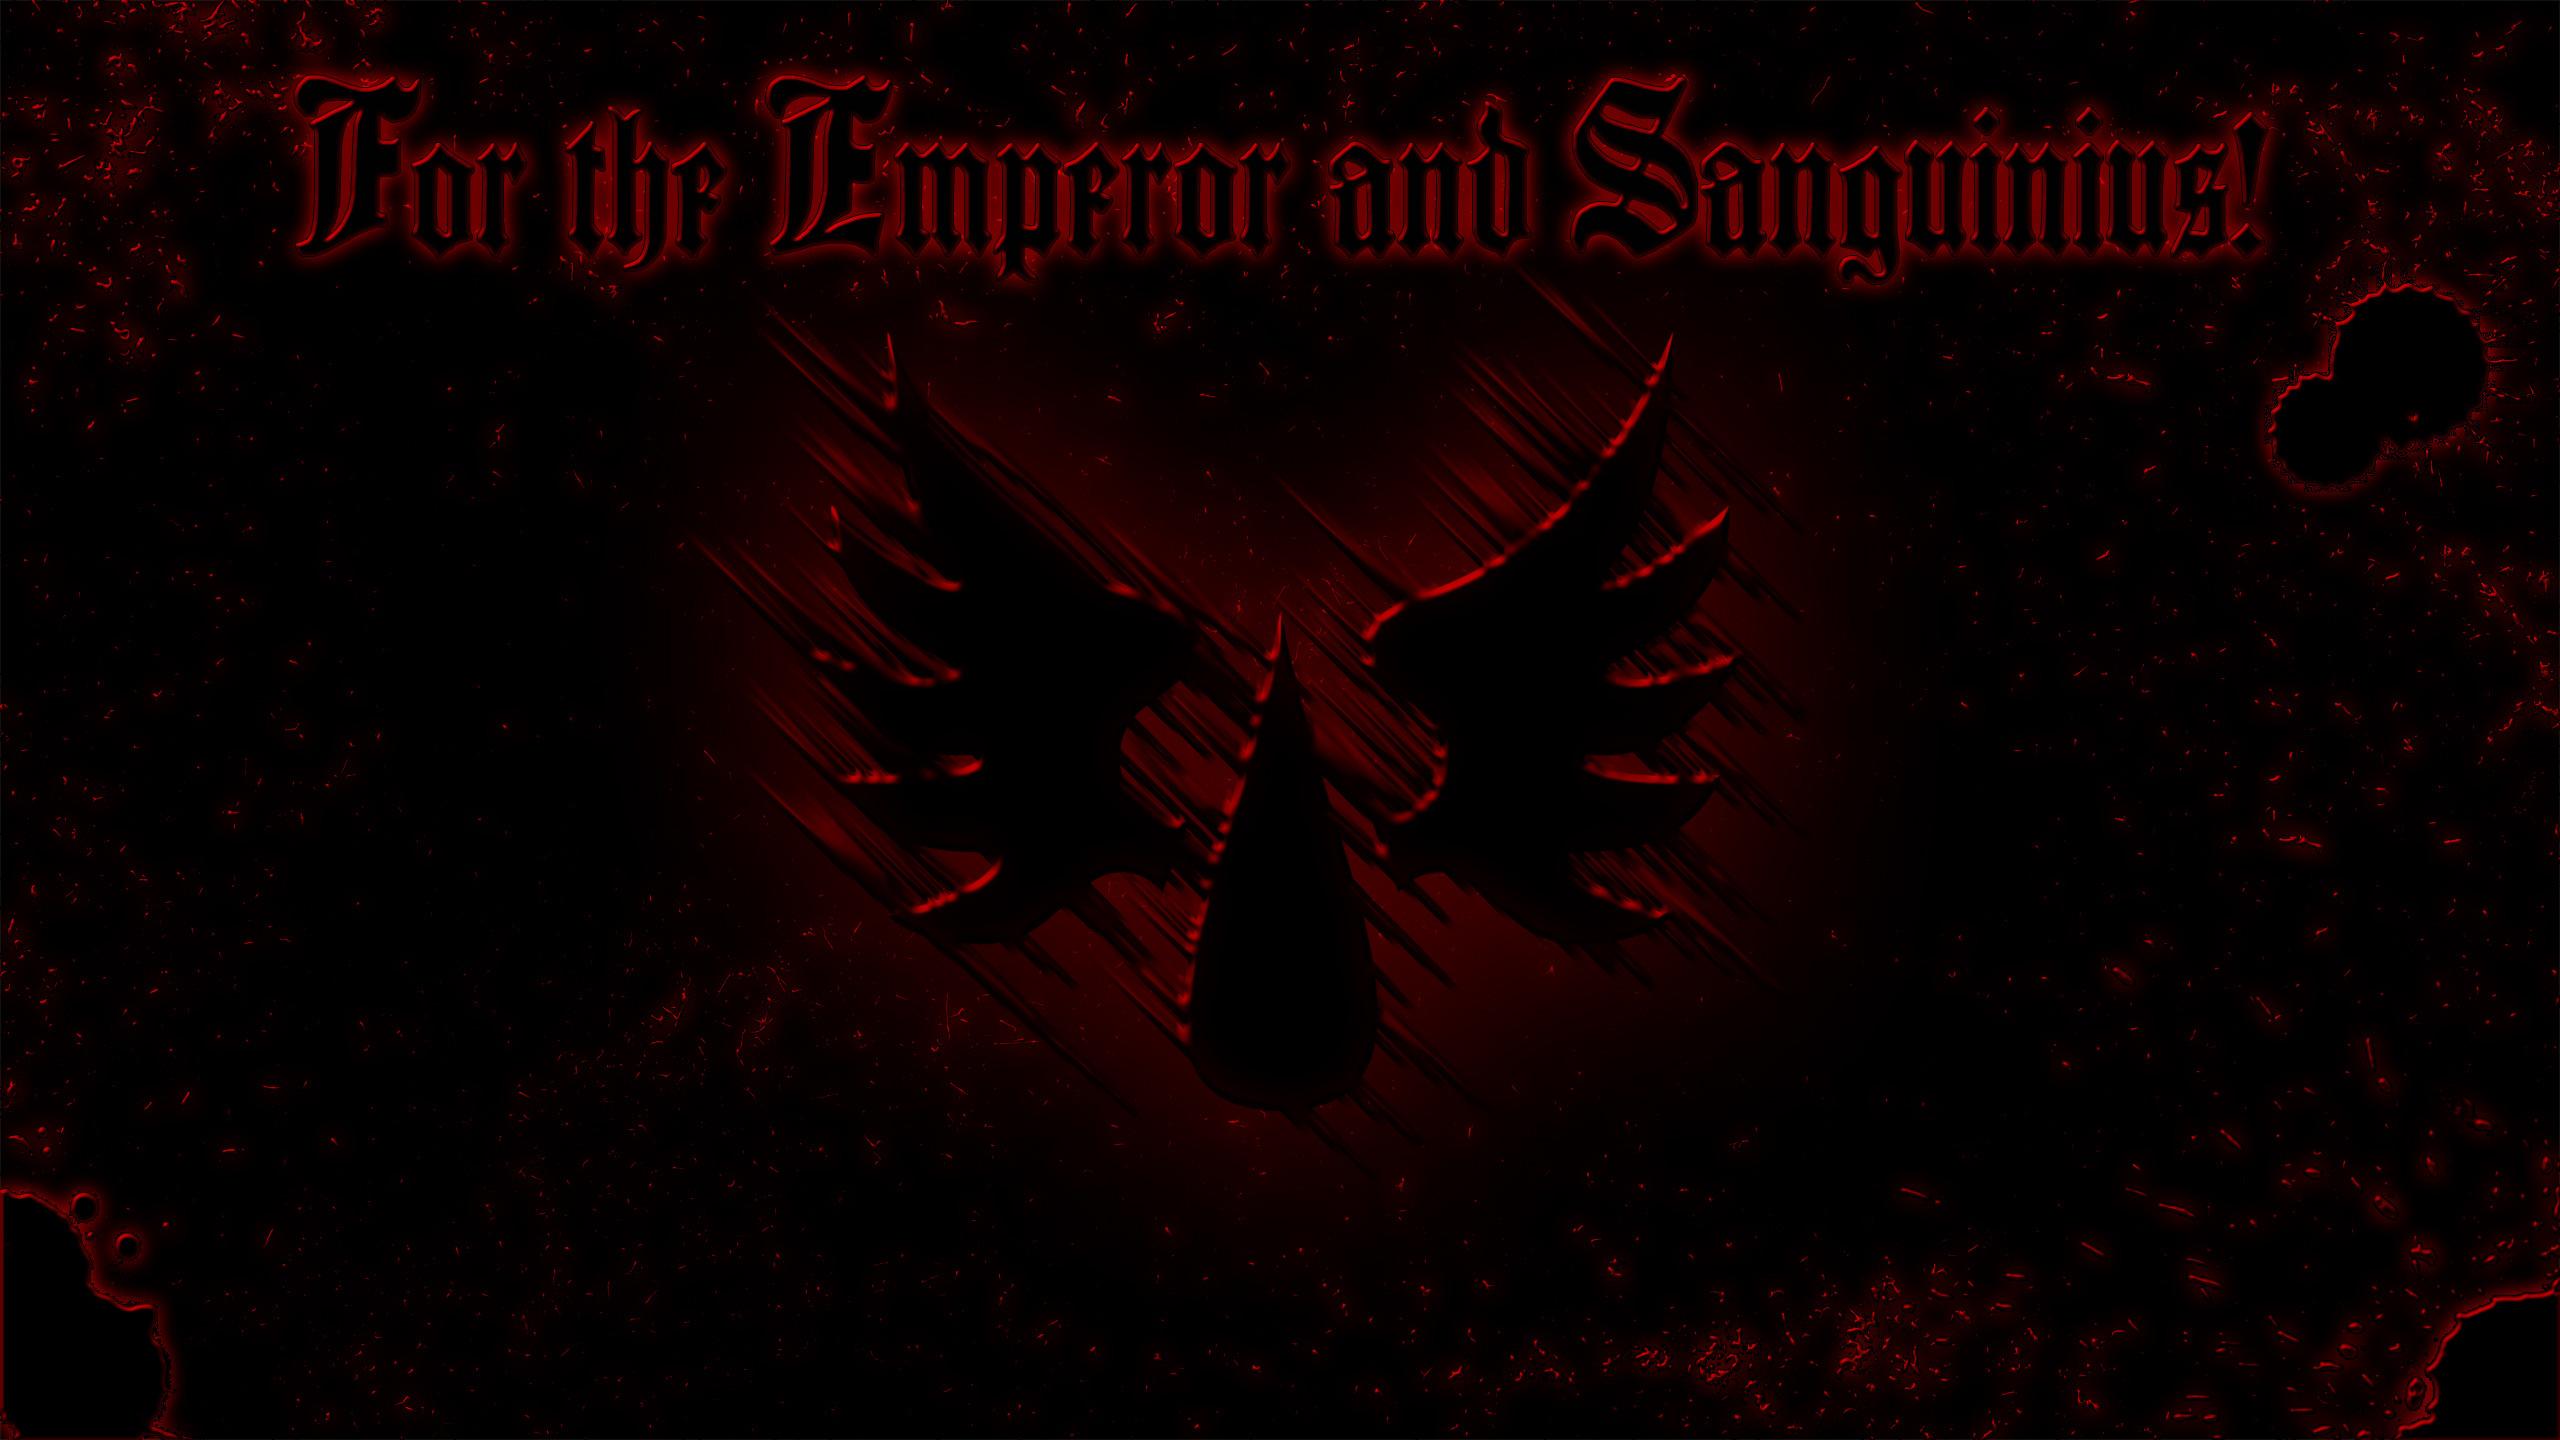 Warhammer Blood Angels Wallpaper WIP by N4zgul999 Warhammer Blood Angels  Wallpaper WIP by N4zgul999